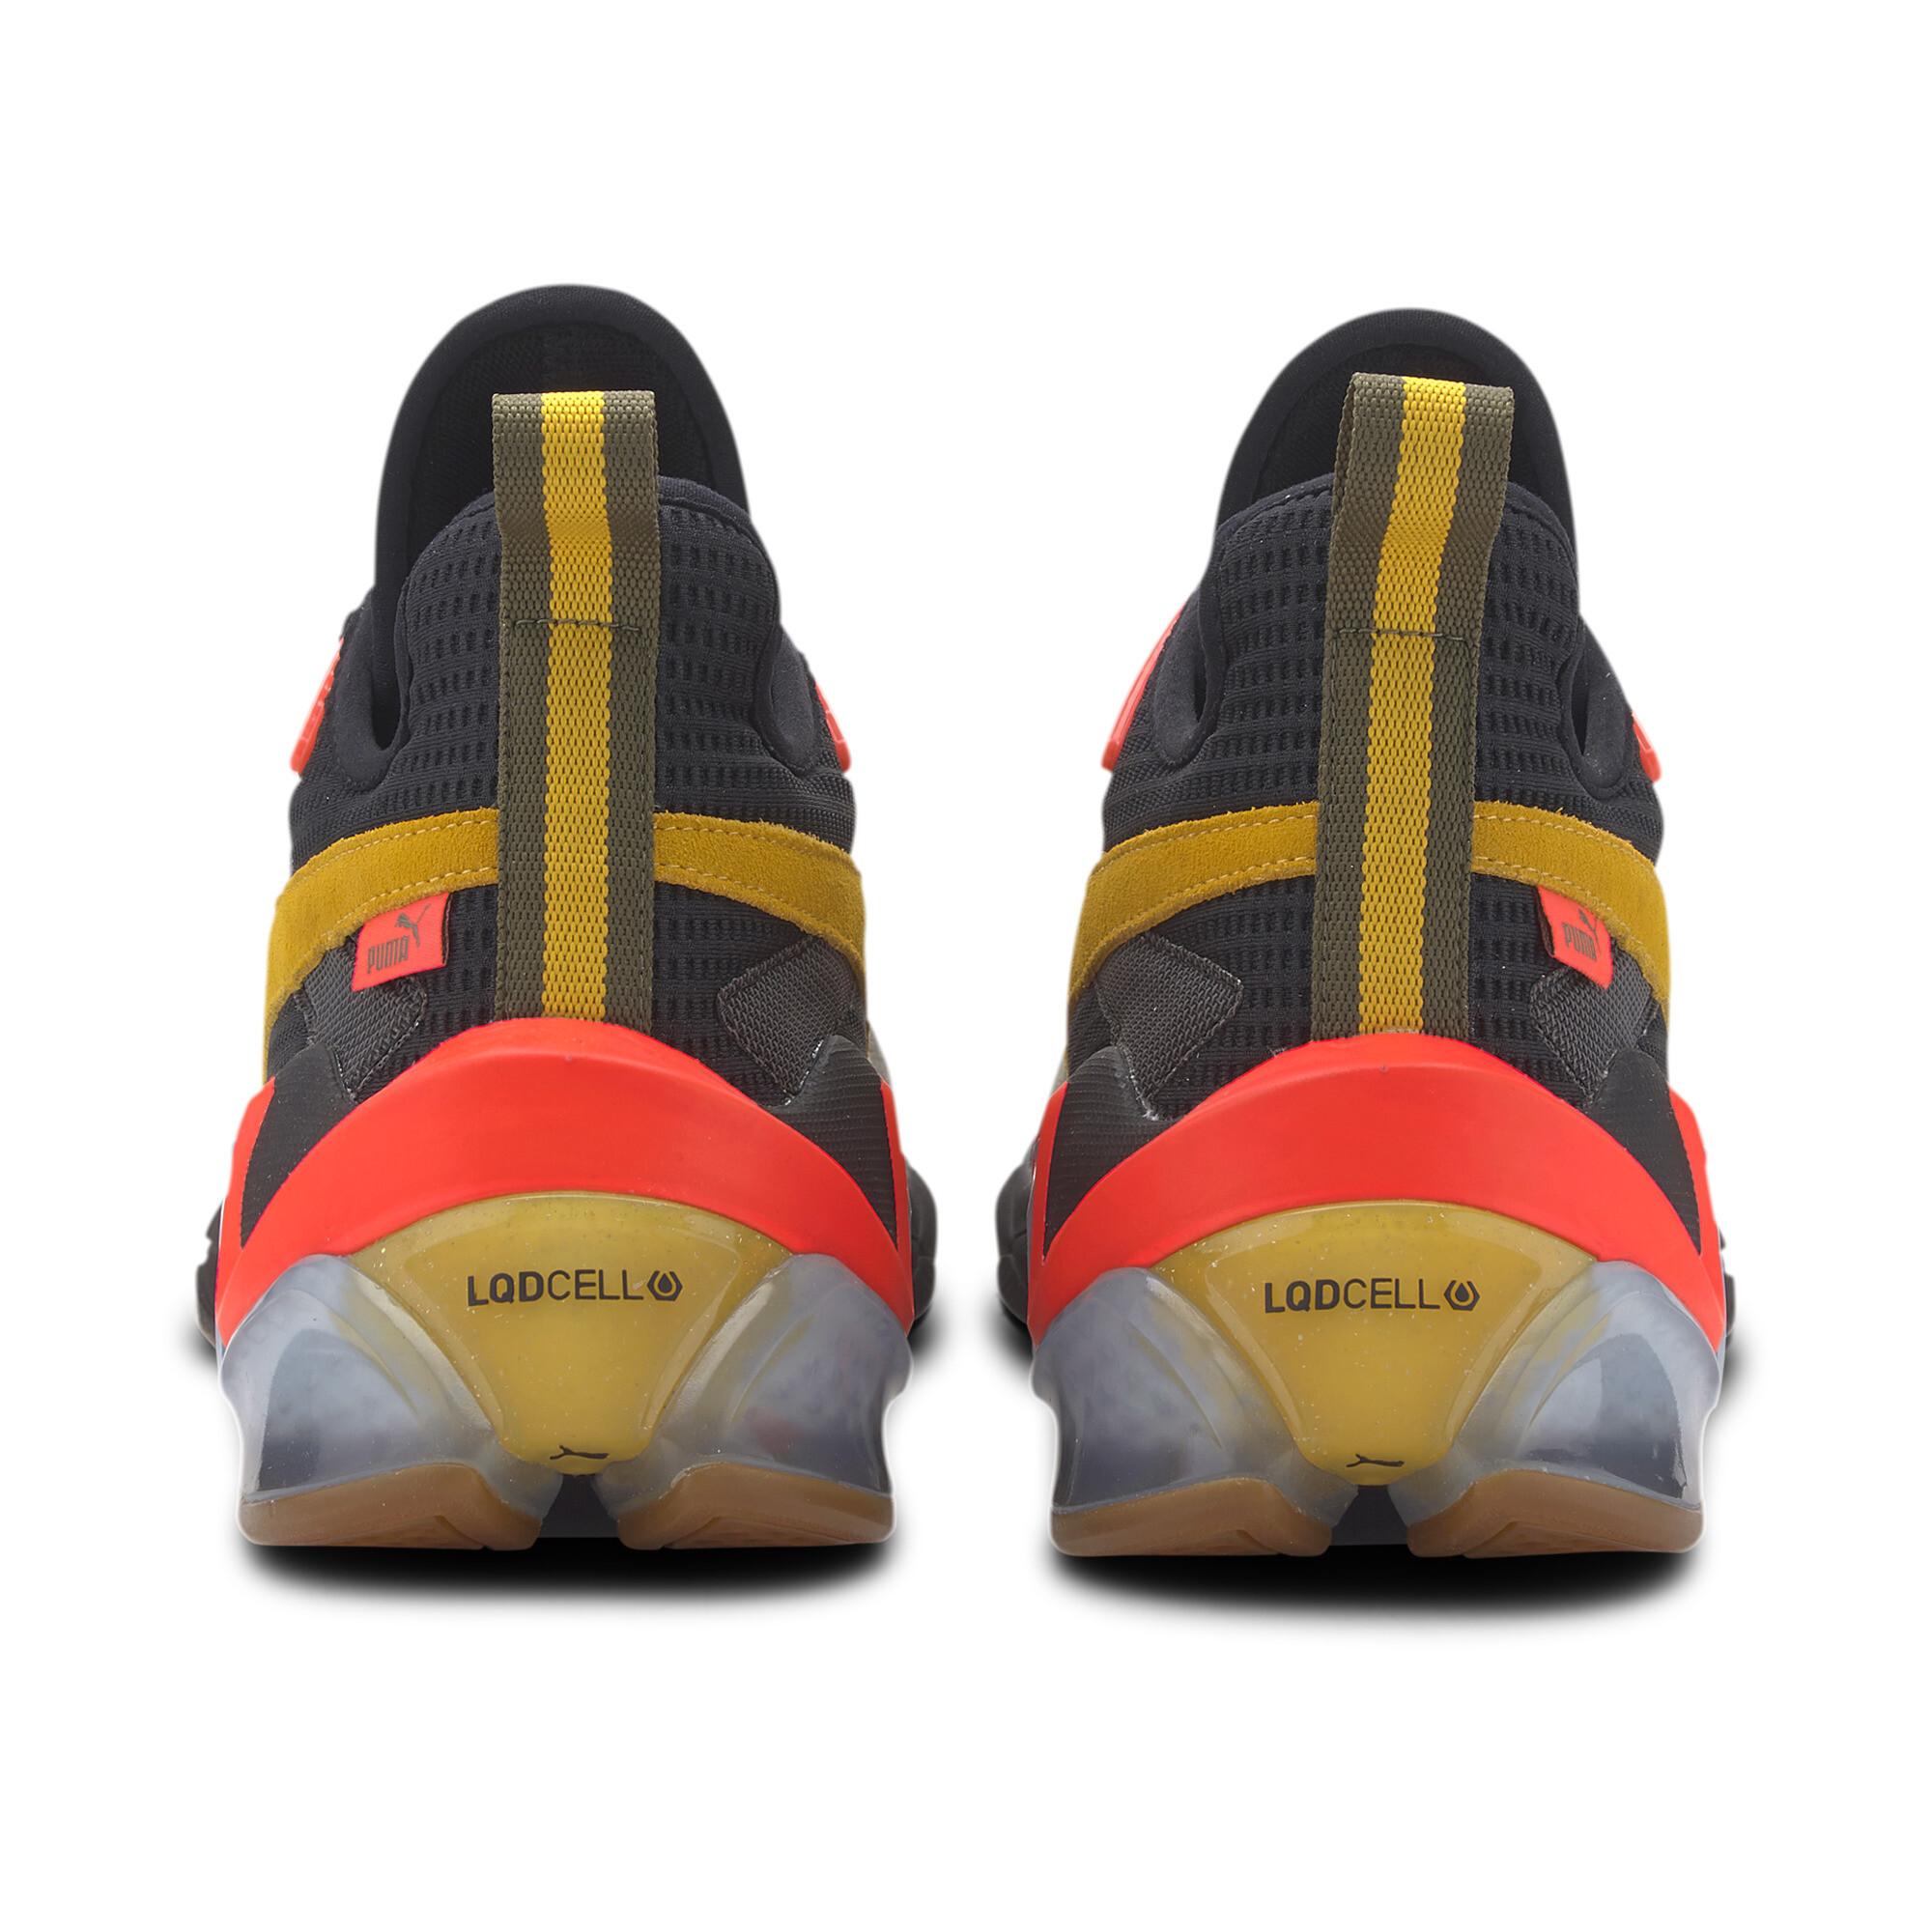 PUMA-Men-039-s-LQDCELL-Origin-Training-Shoes thumbnail 15